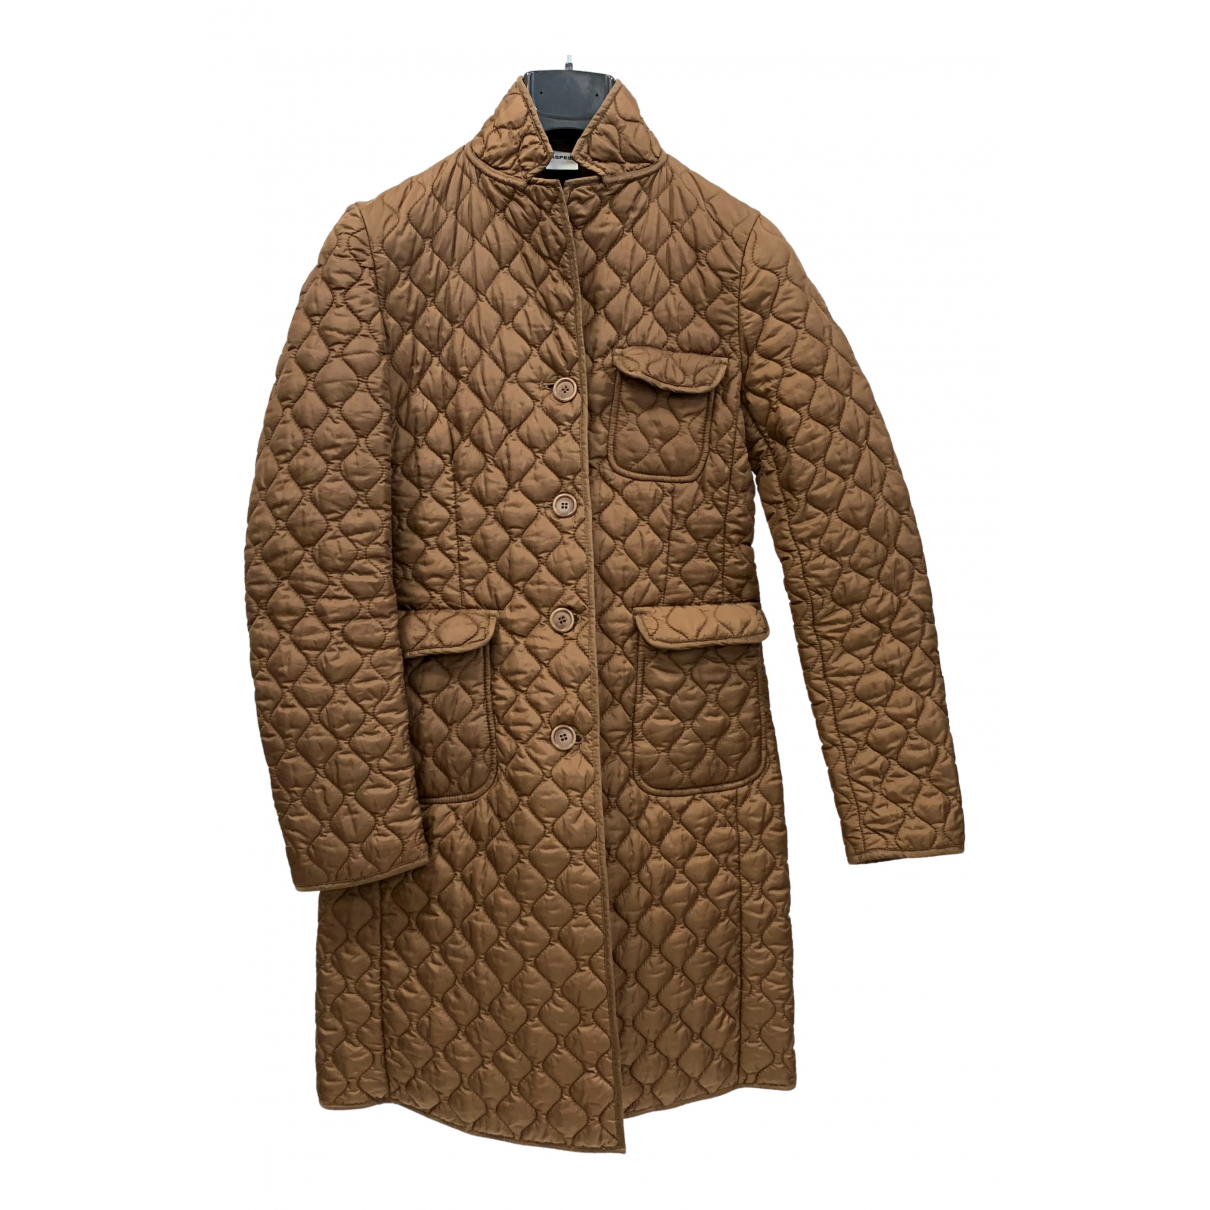 Aspesi \N Brown coat for Women S International